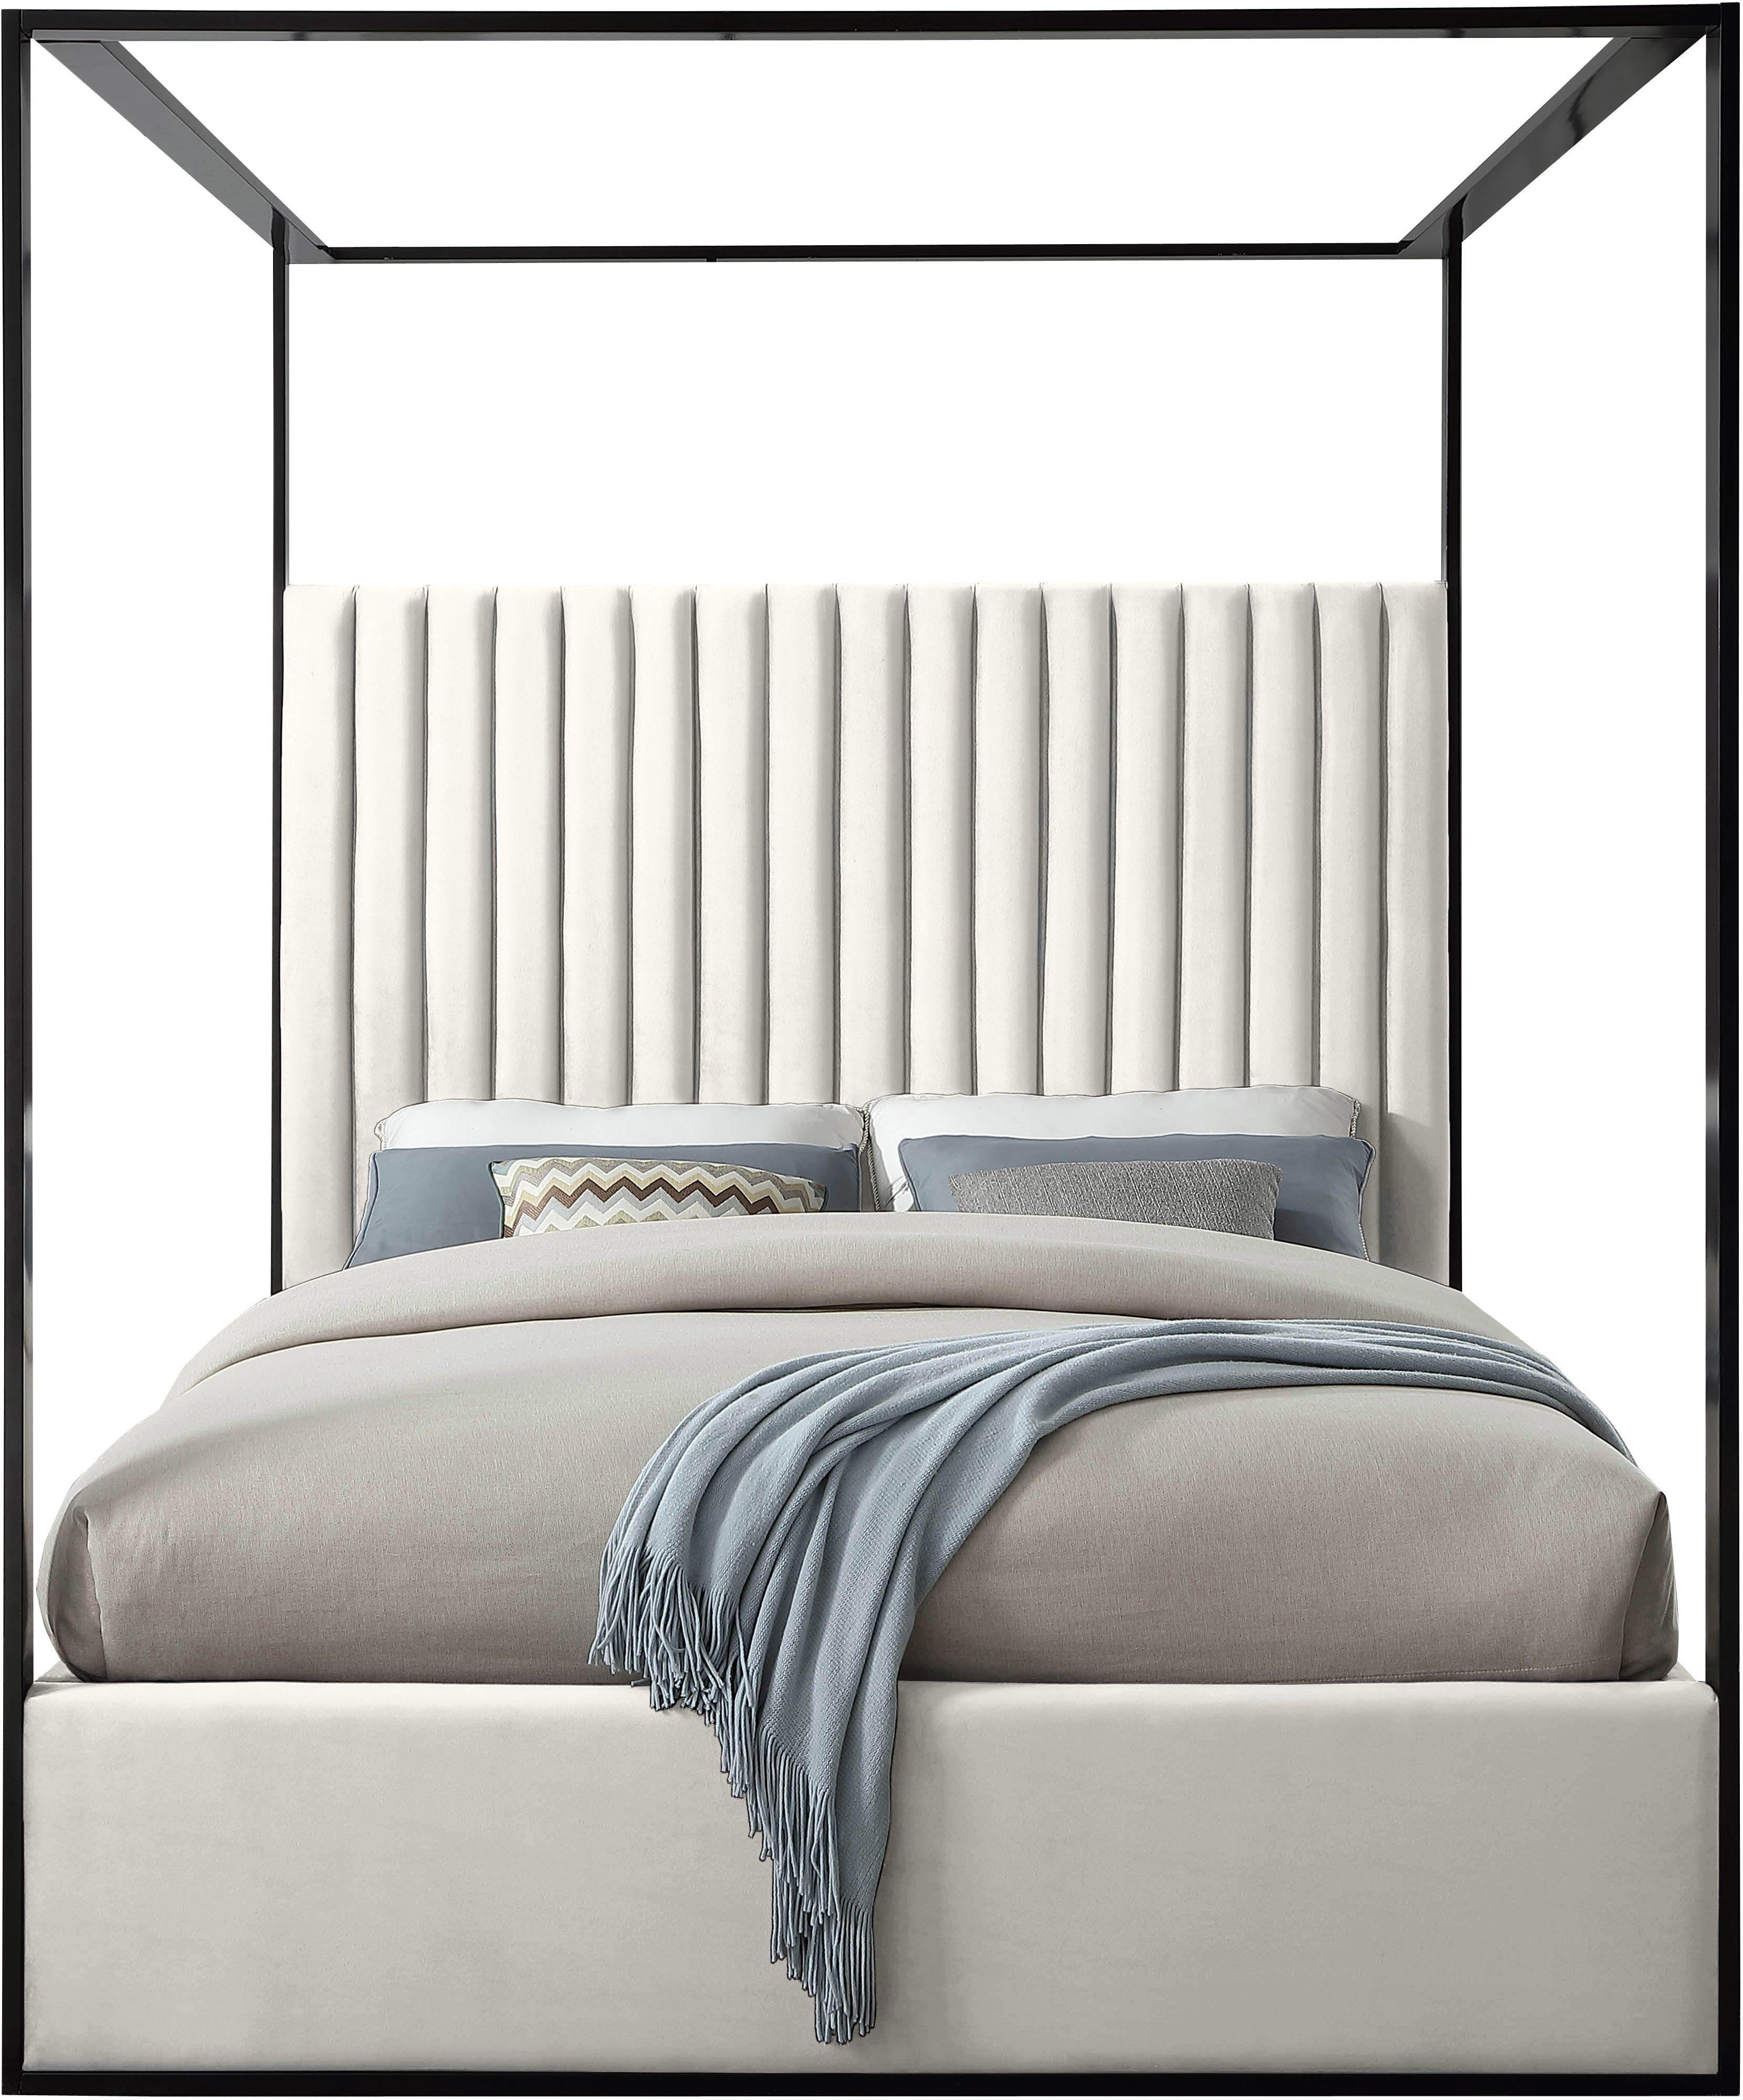 Meridian Jax Cream Contemporary Velvet Canopy Queen Bed In